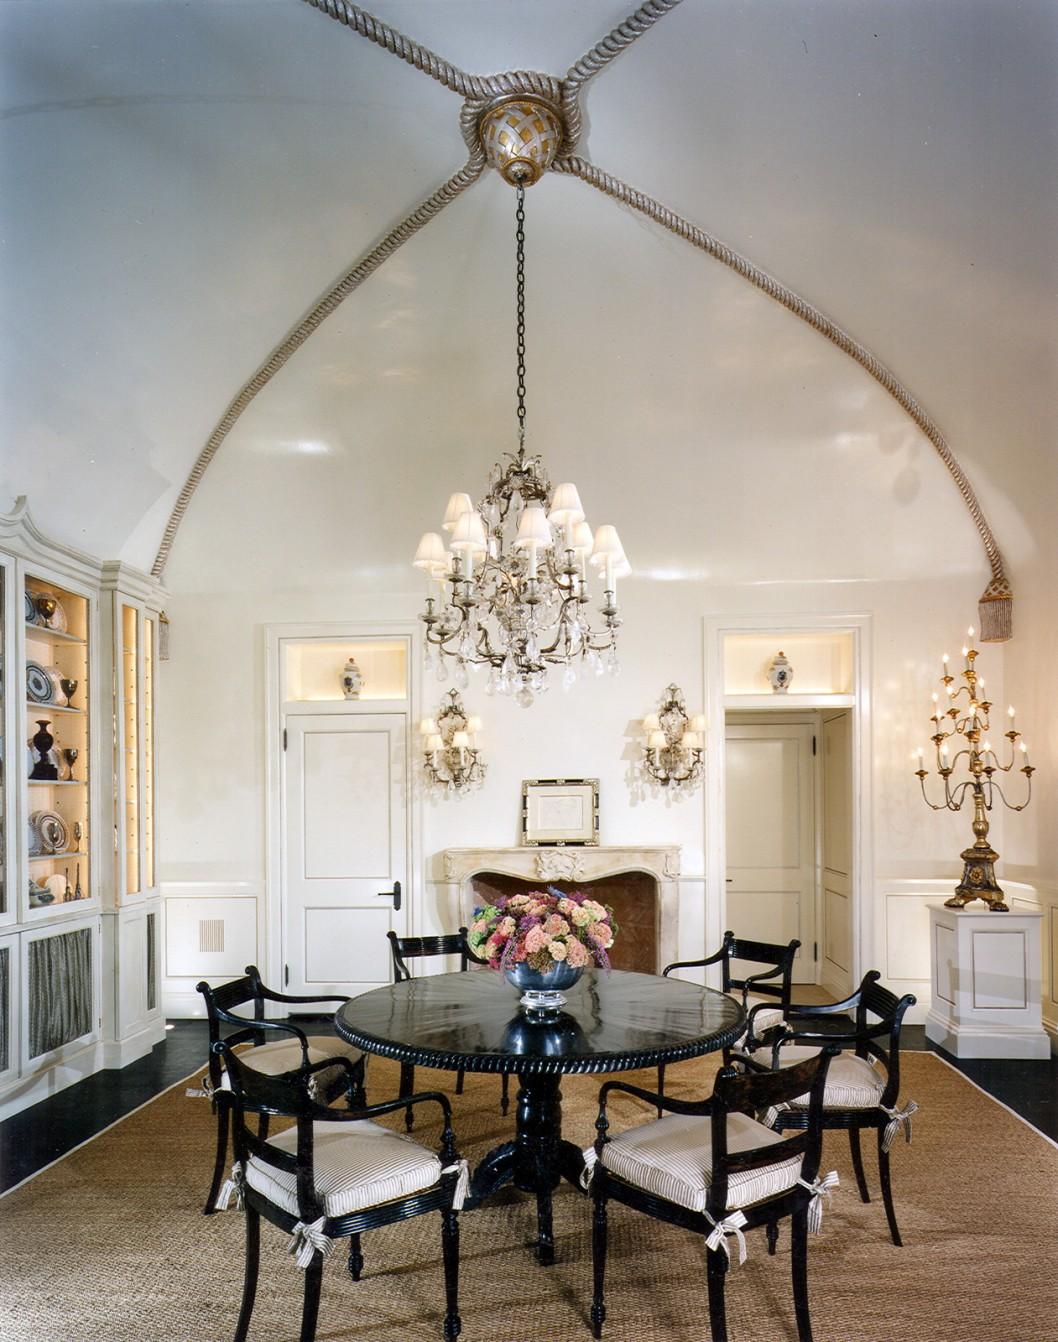 dining table ceiling lights  warisan lighting, Lighting ideas